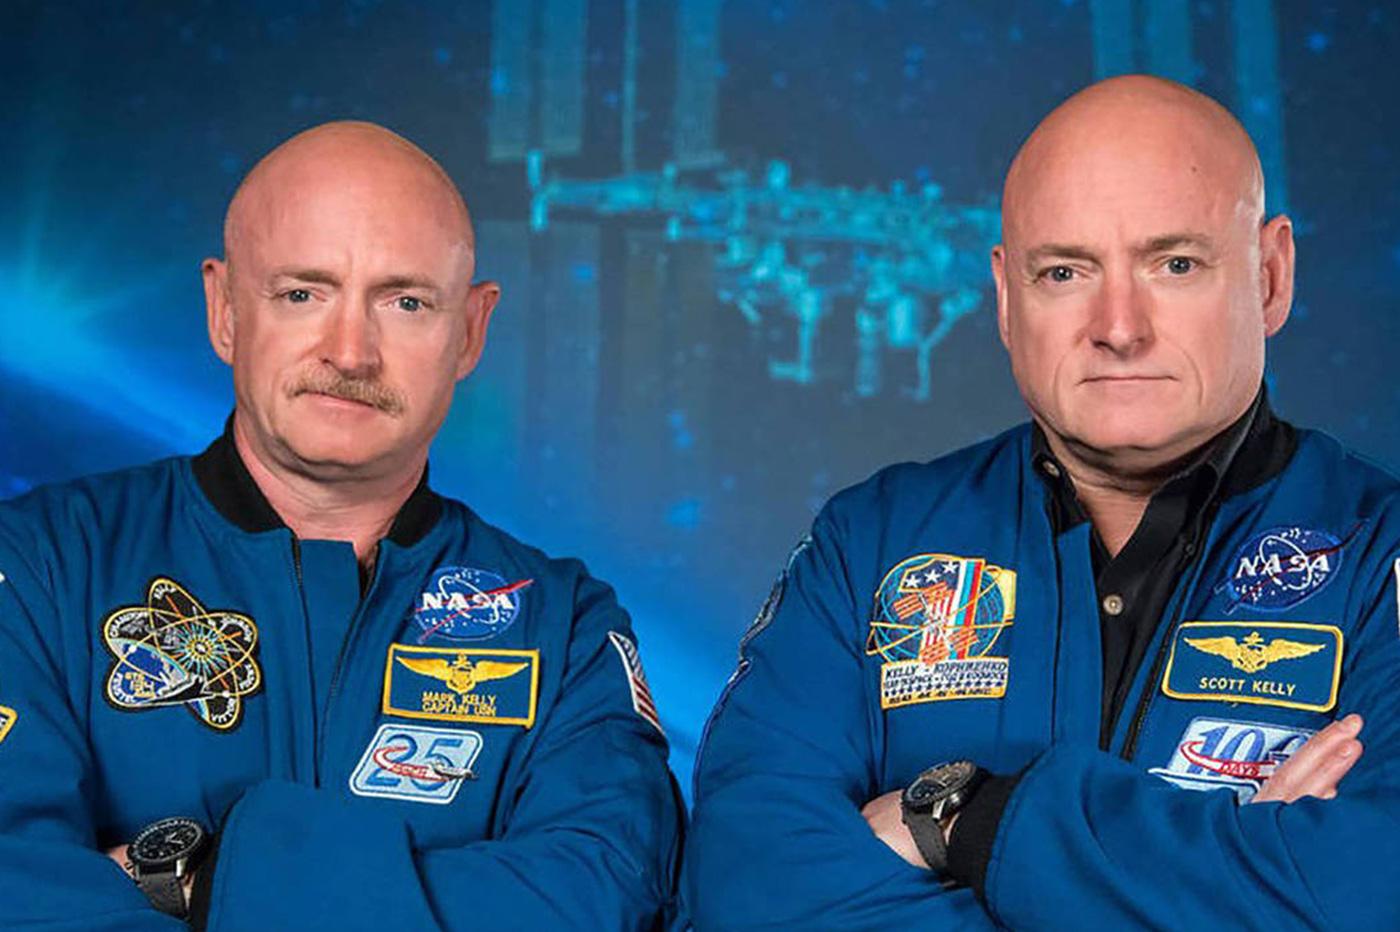 NASA jumeaux espace